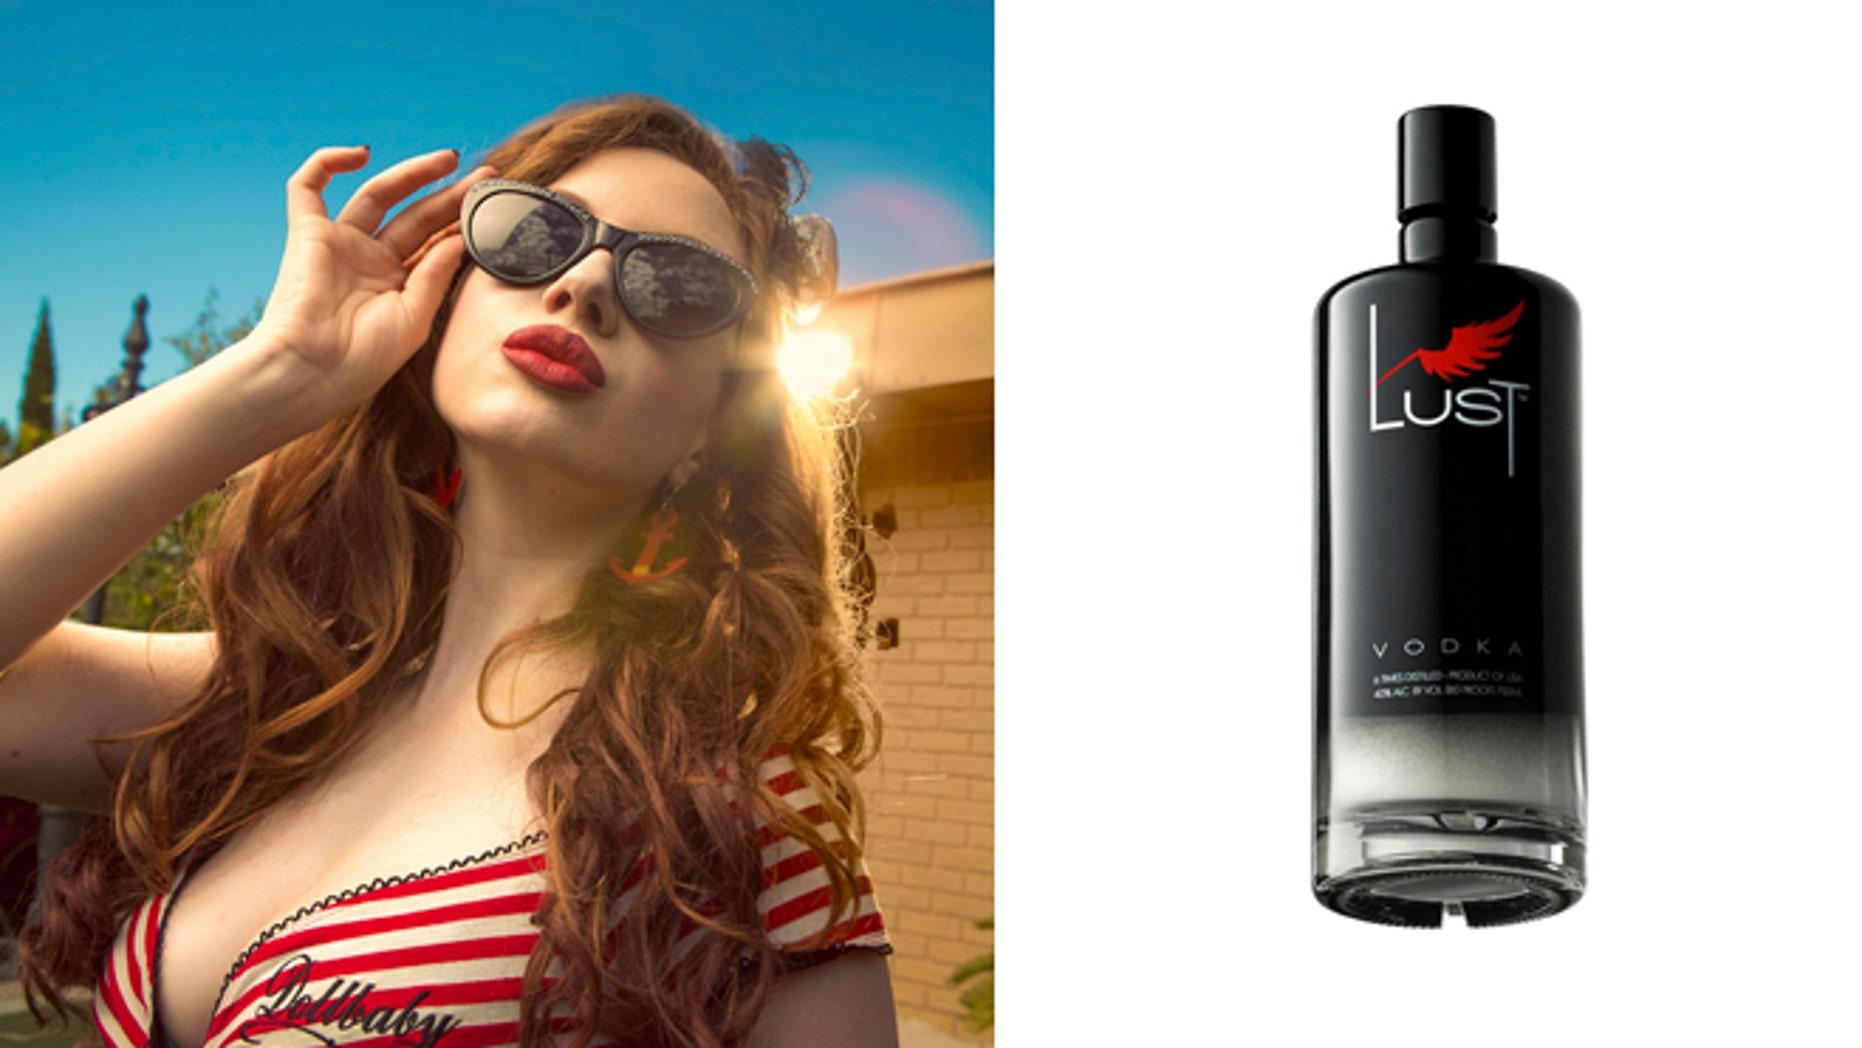 Can a vodka really boost a woman's libido?